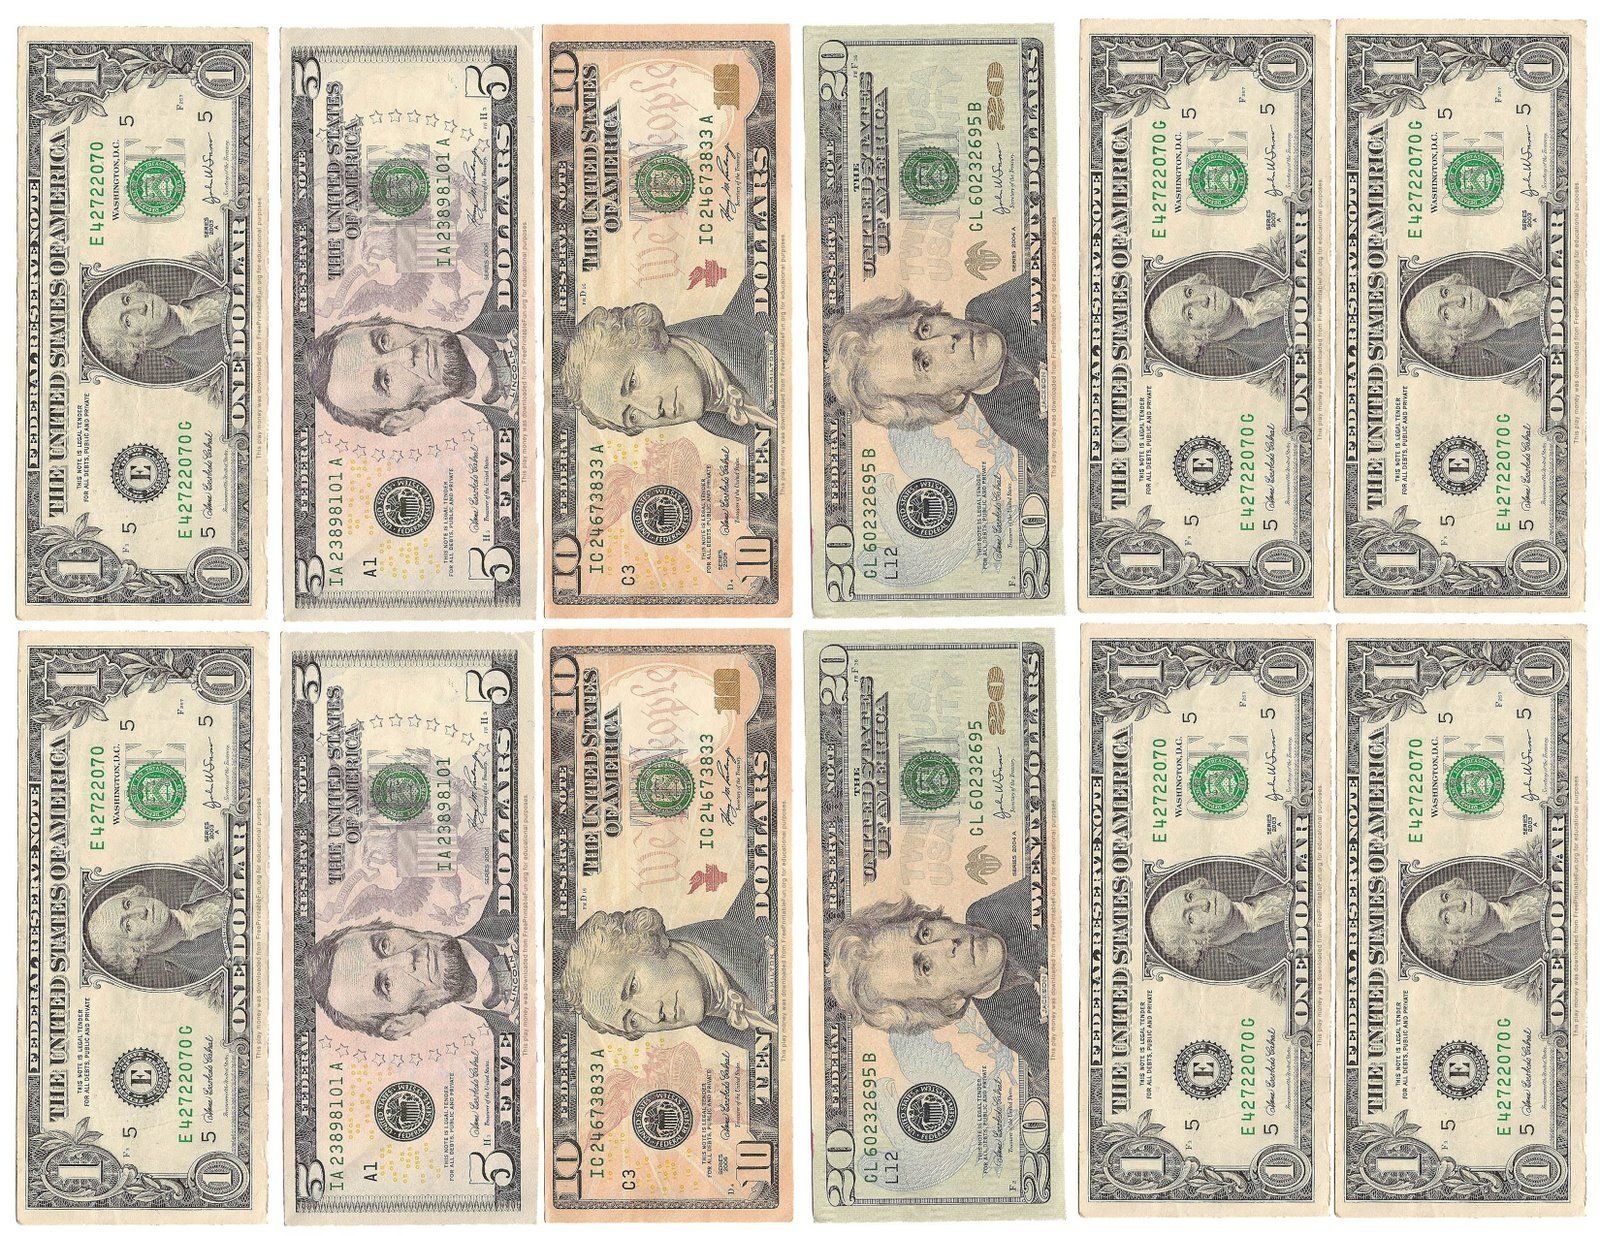 Free Printable Fake Money That Looks Real